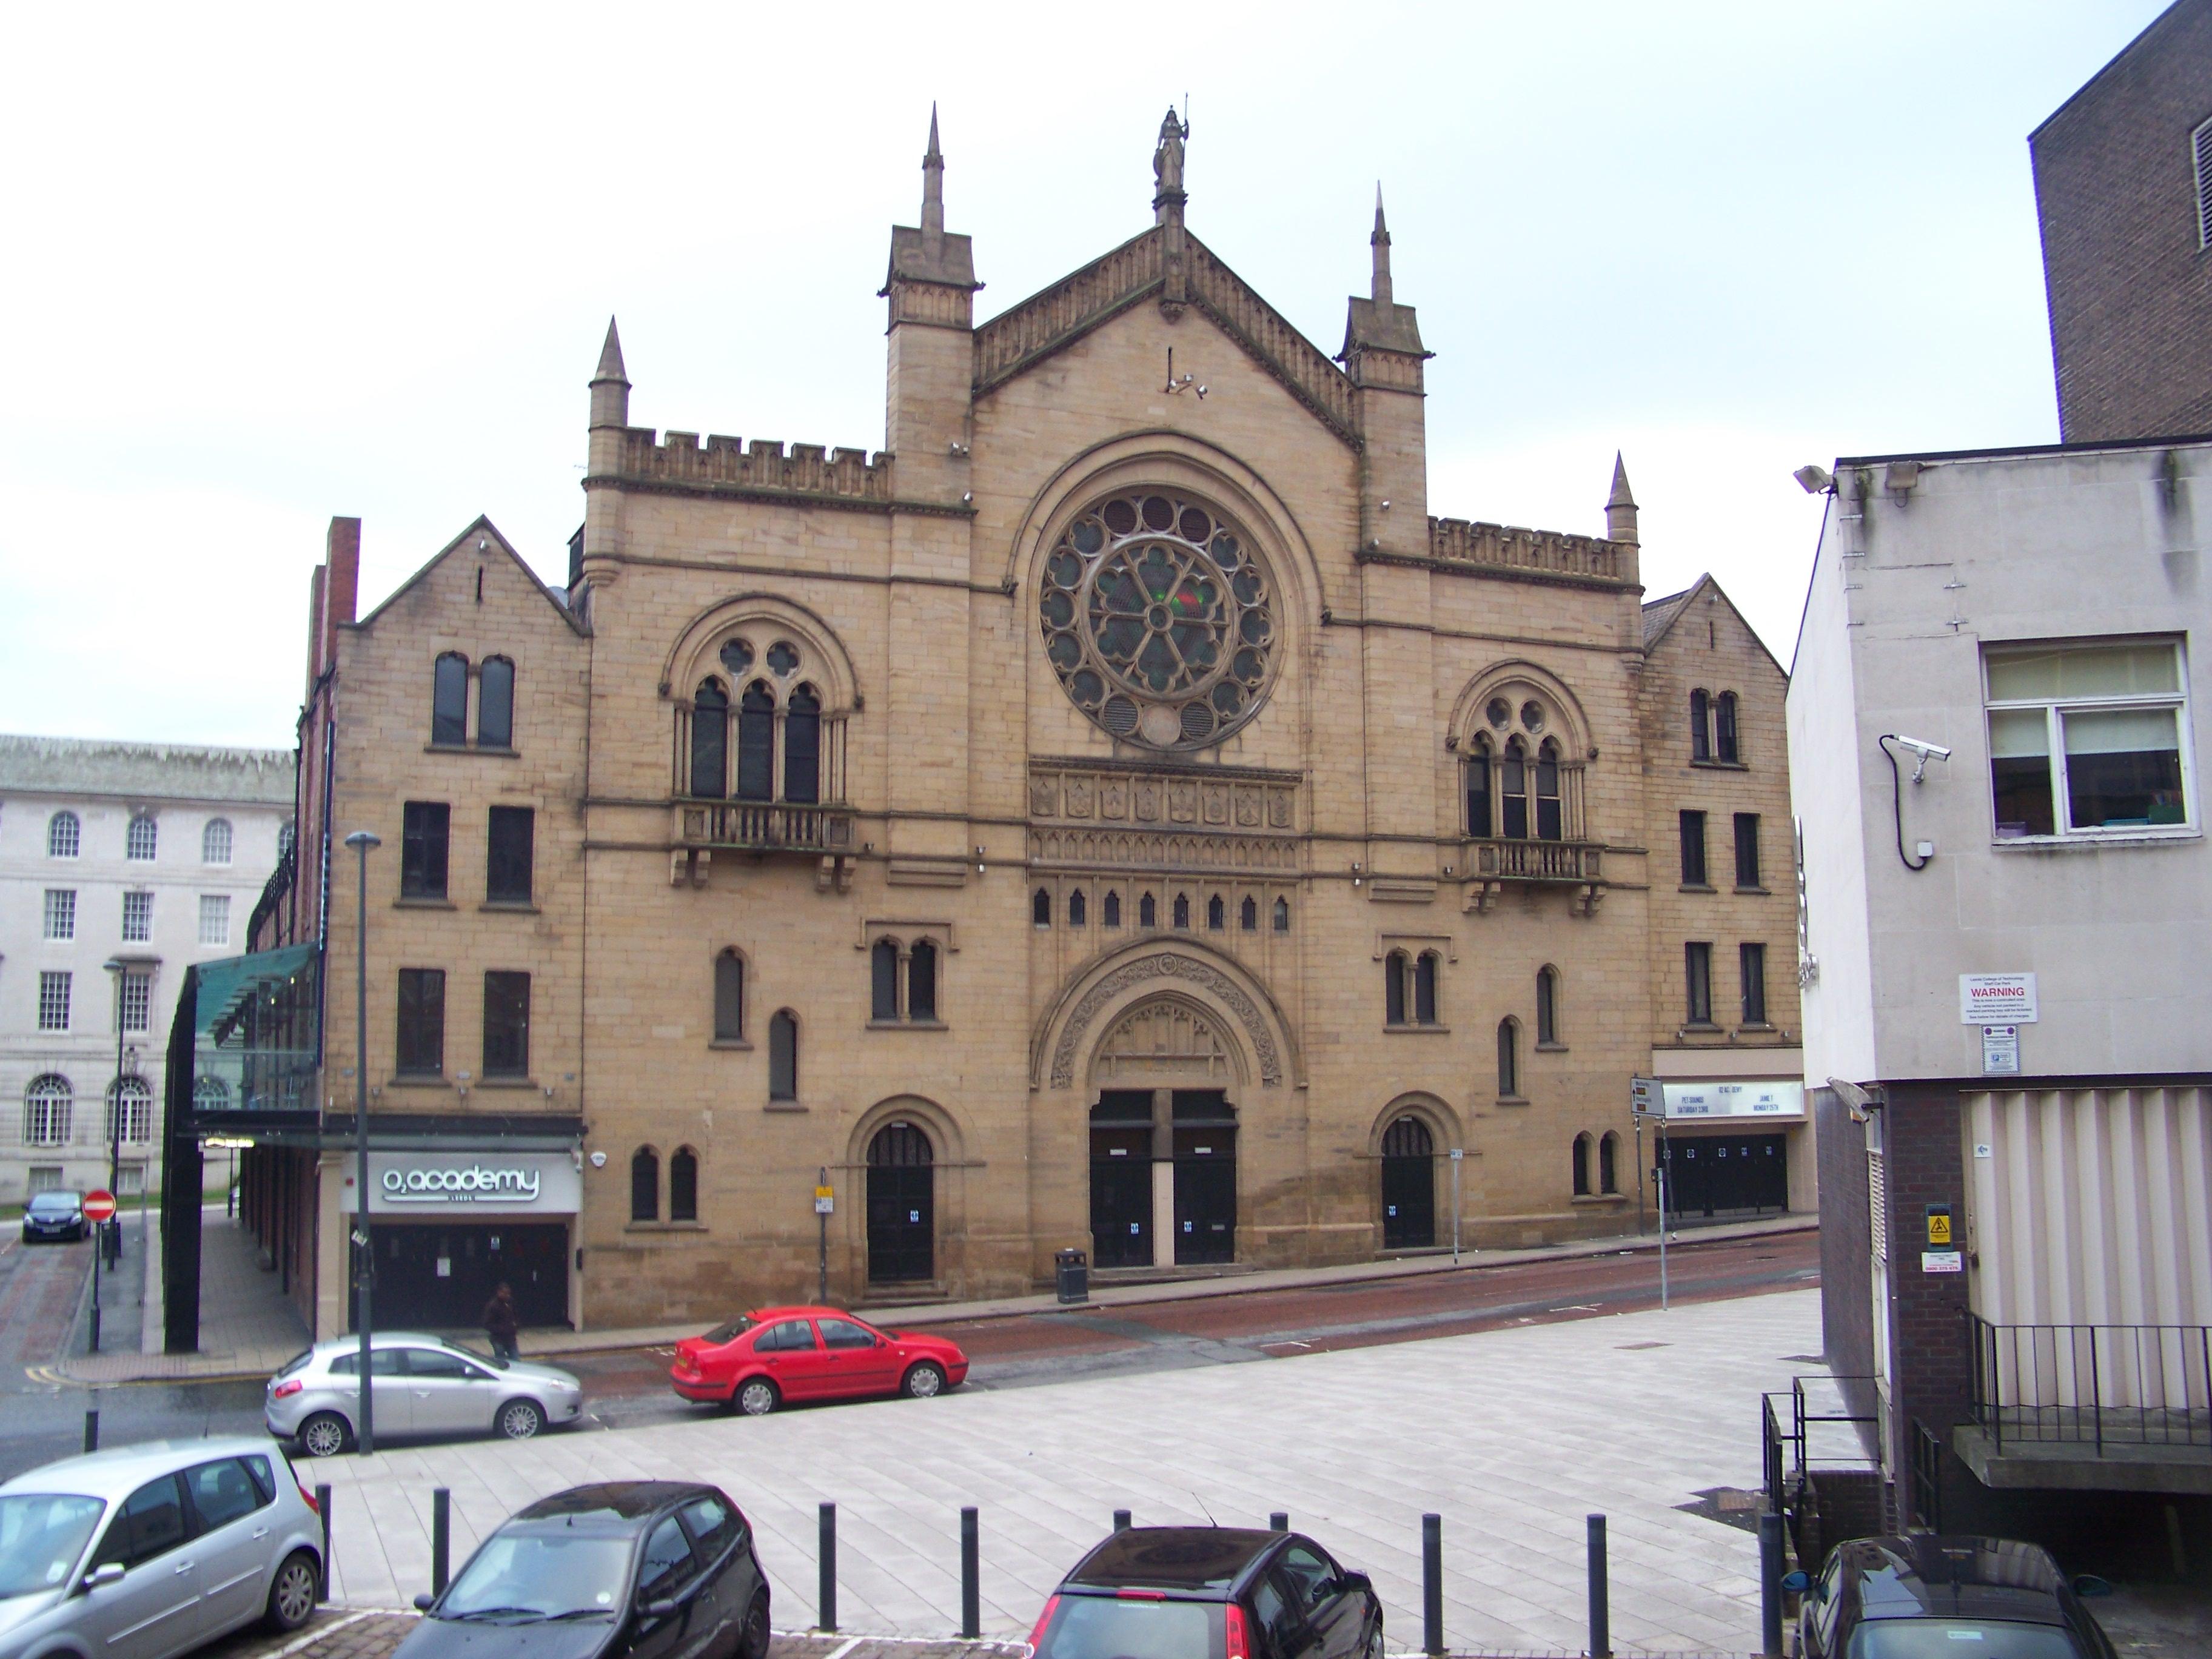 File:O2 Academy, Leeds 002.jpg - Wikimedia Commons